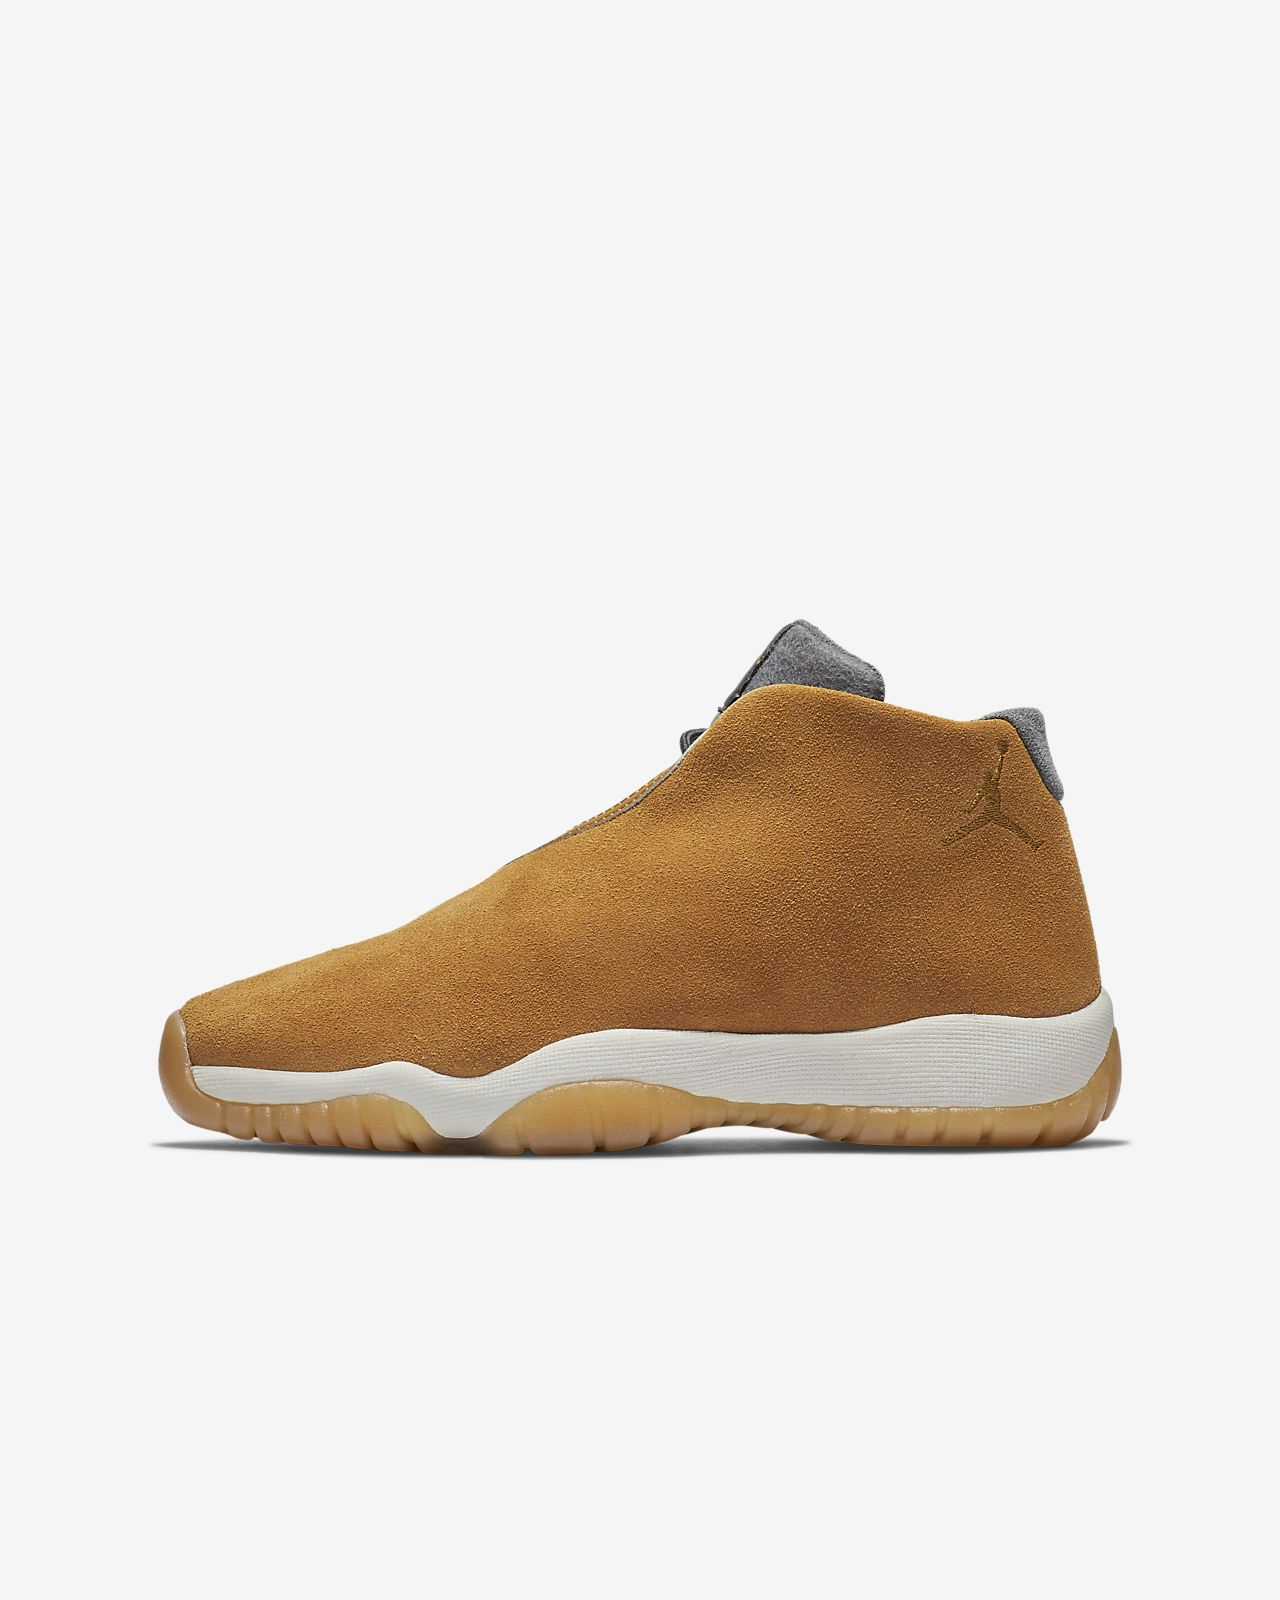 Air Jordan Future Schuh für ältere Kinder